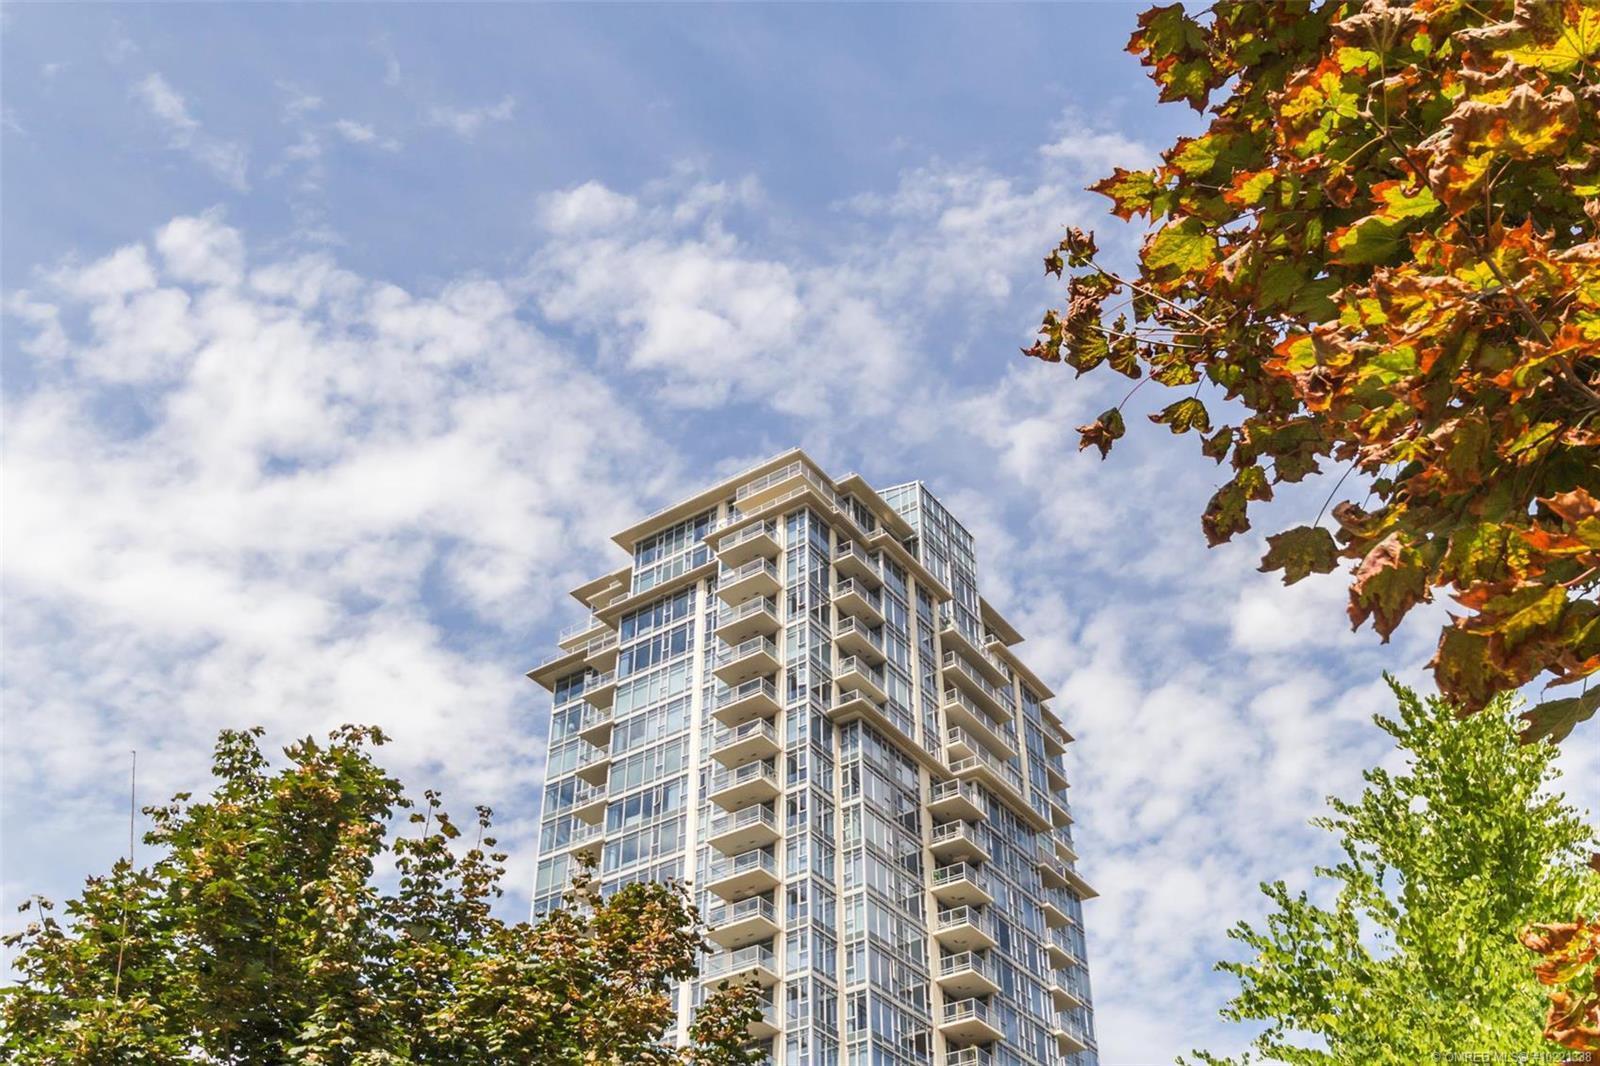 #404 1075 Sunset Drive, - Kelowna Apartment for sale, 1 Bedroom (10221338) - #13